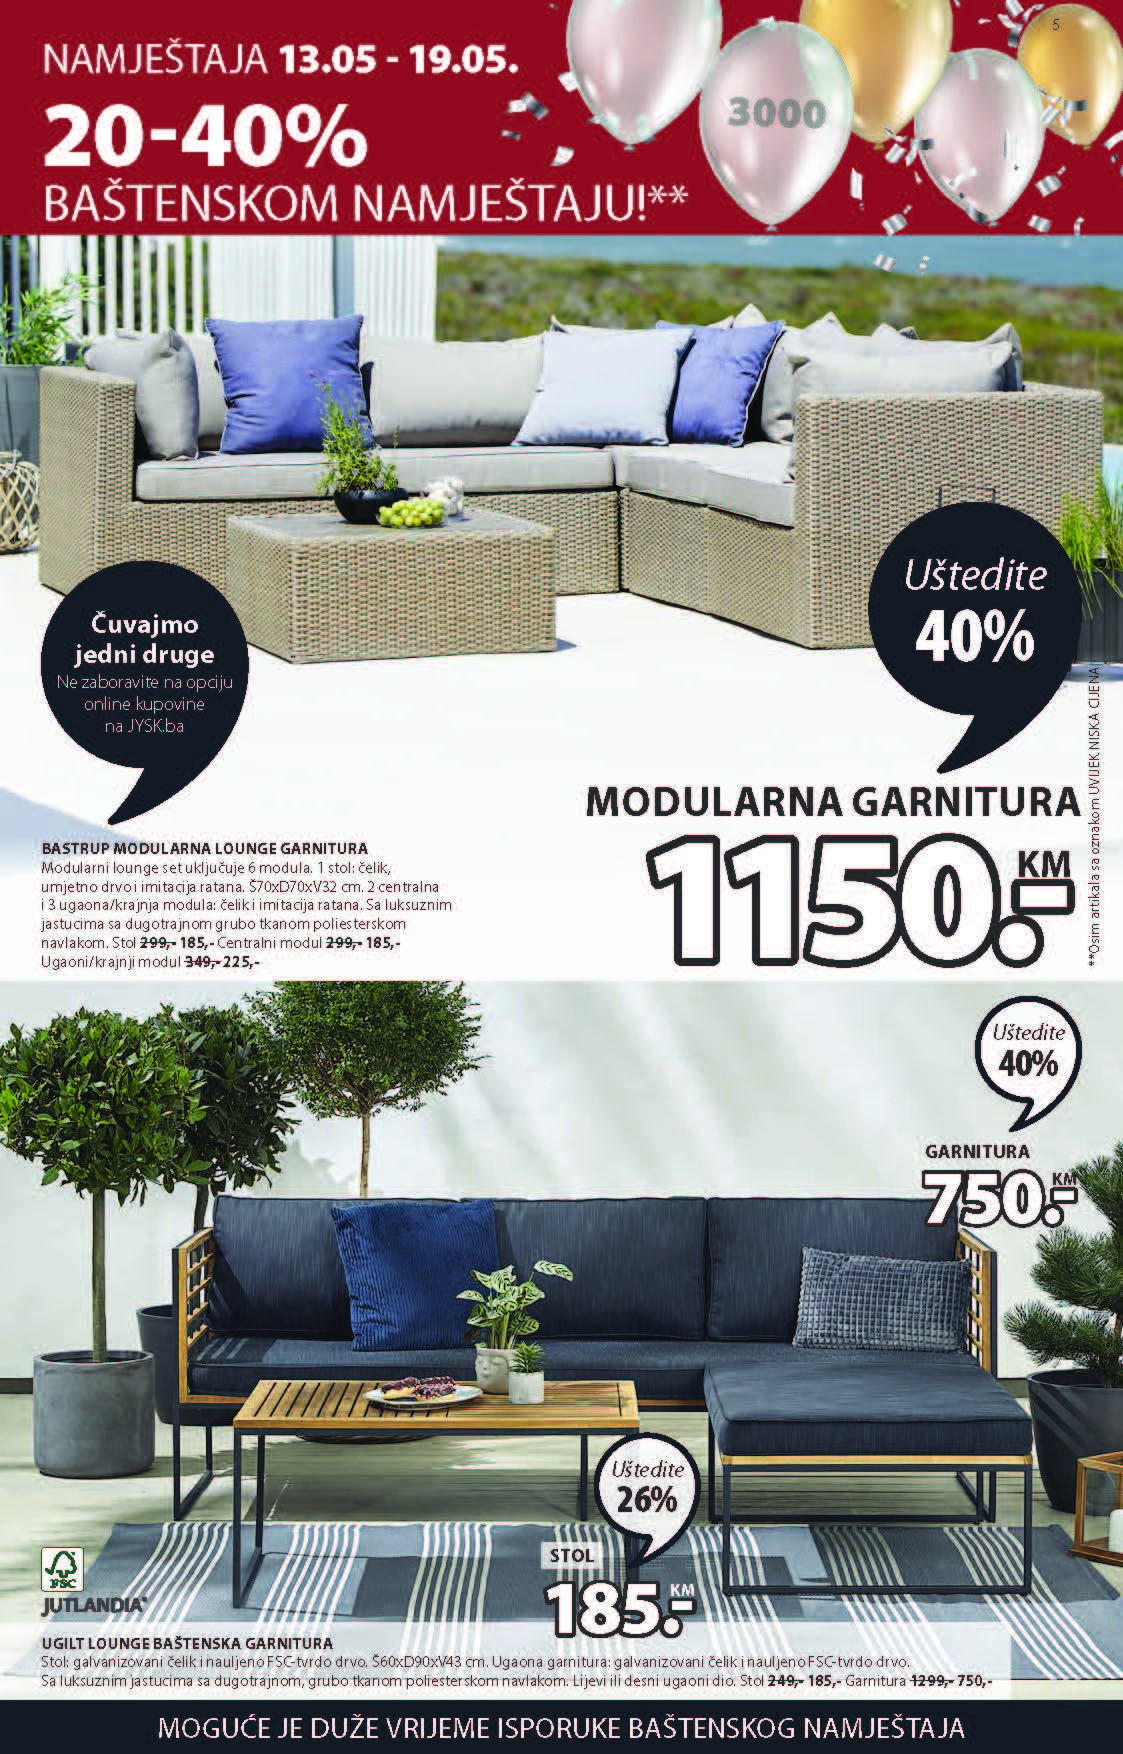 JYSK Katalog Akcijska ponuda MAJ 13.05.2021. 26.05.2021 ekatalozi.com Page 06